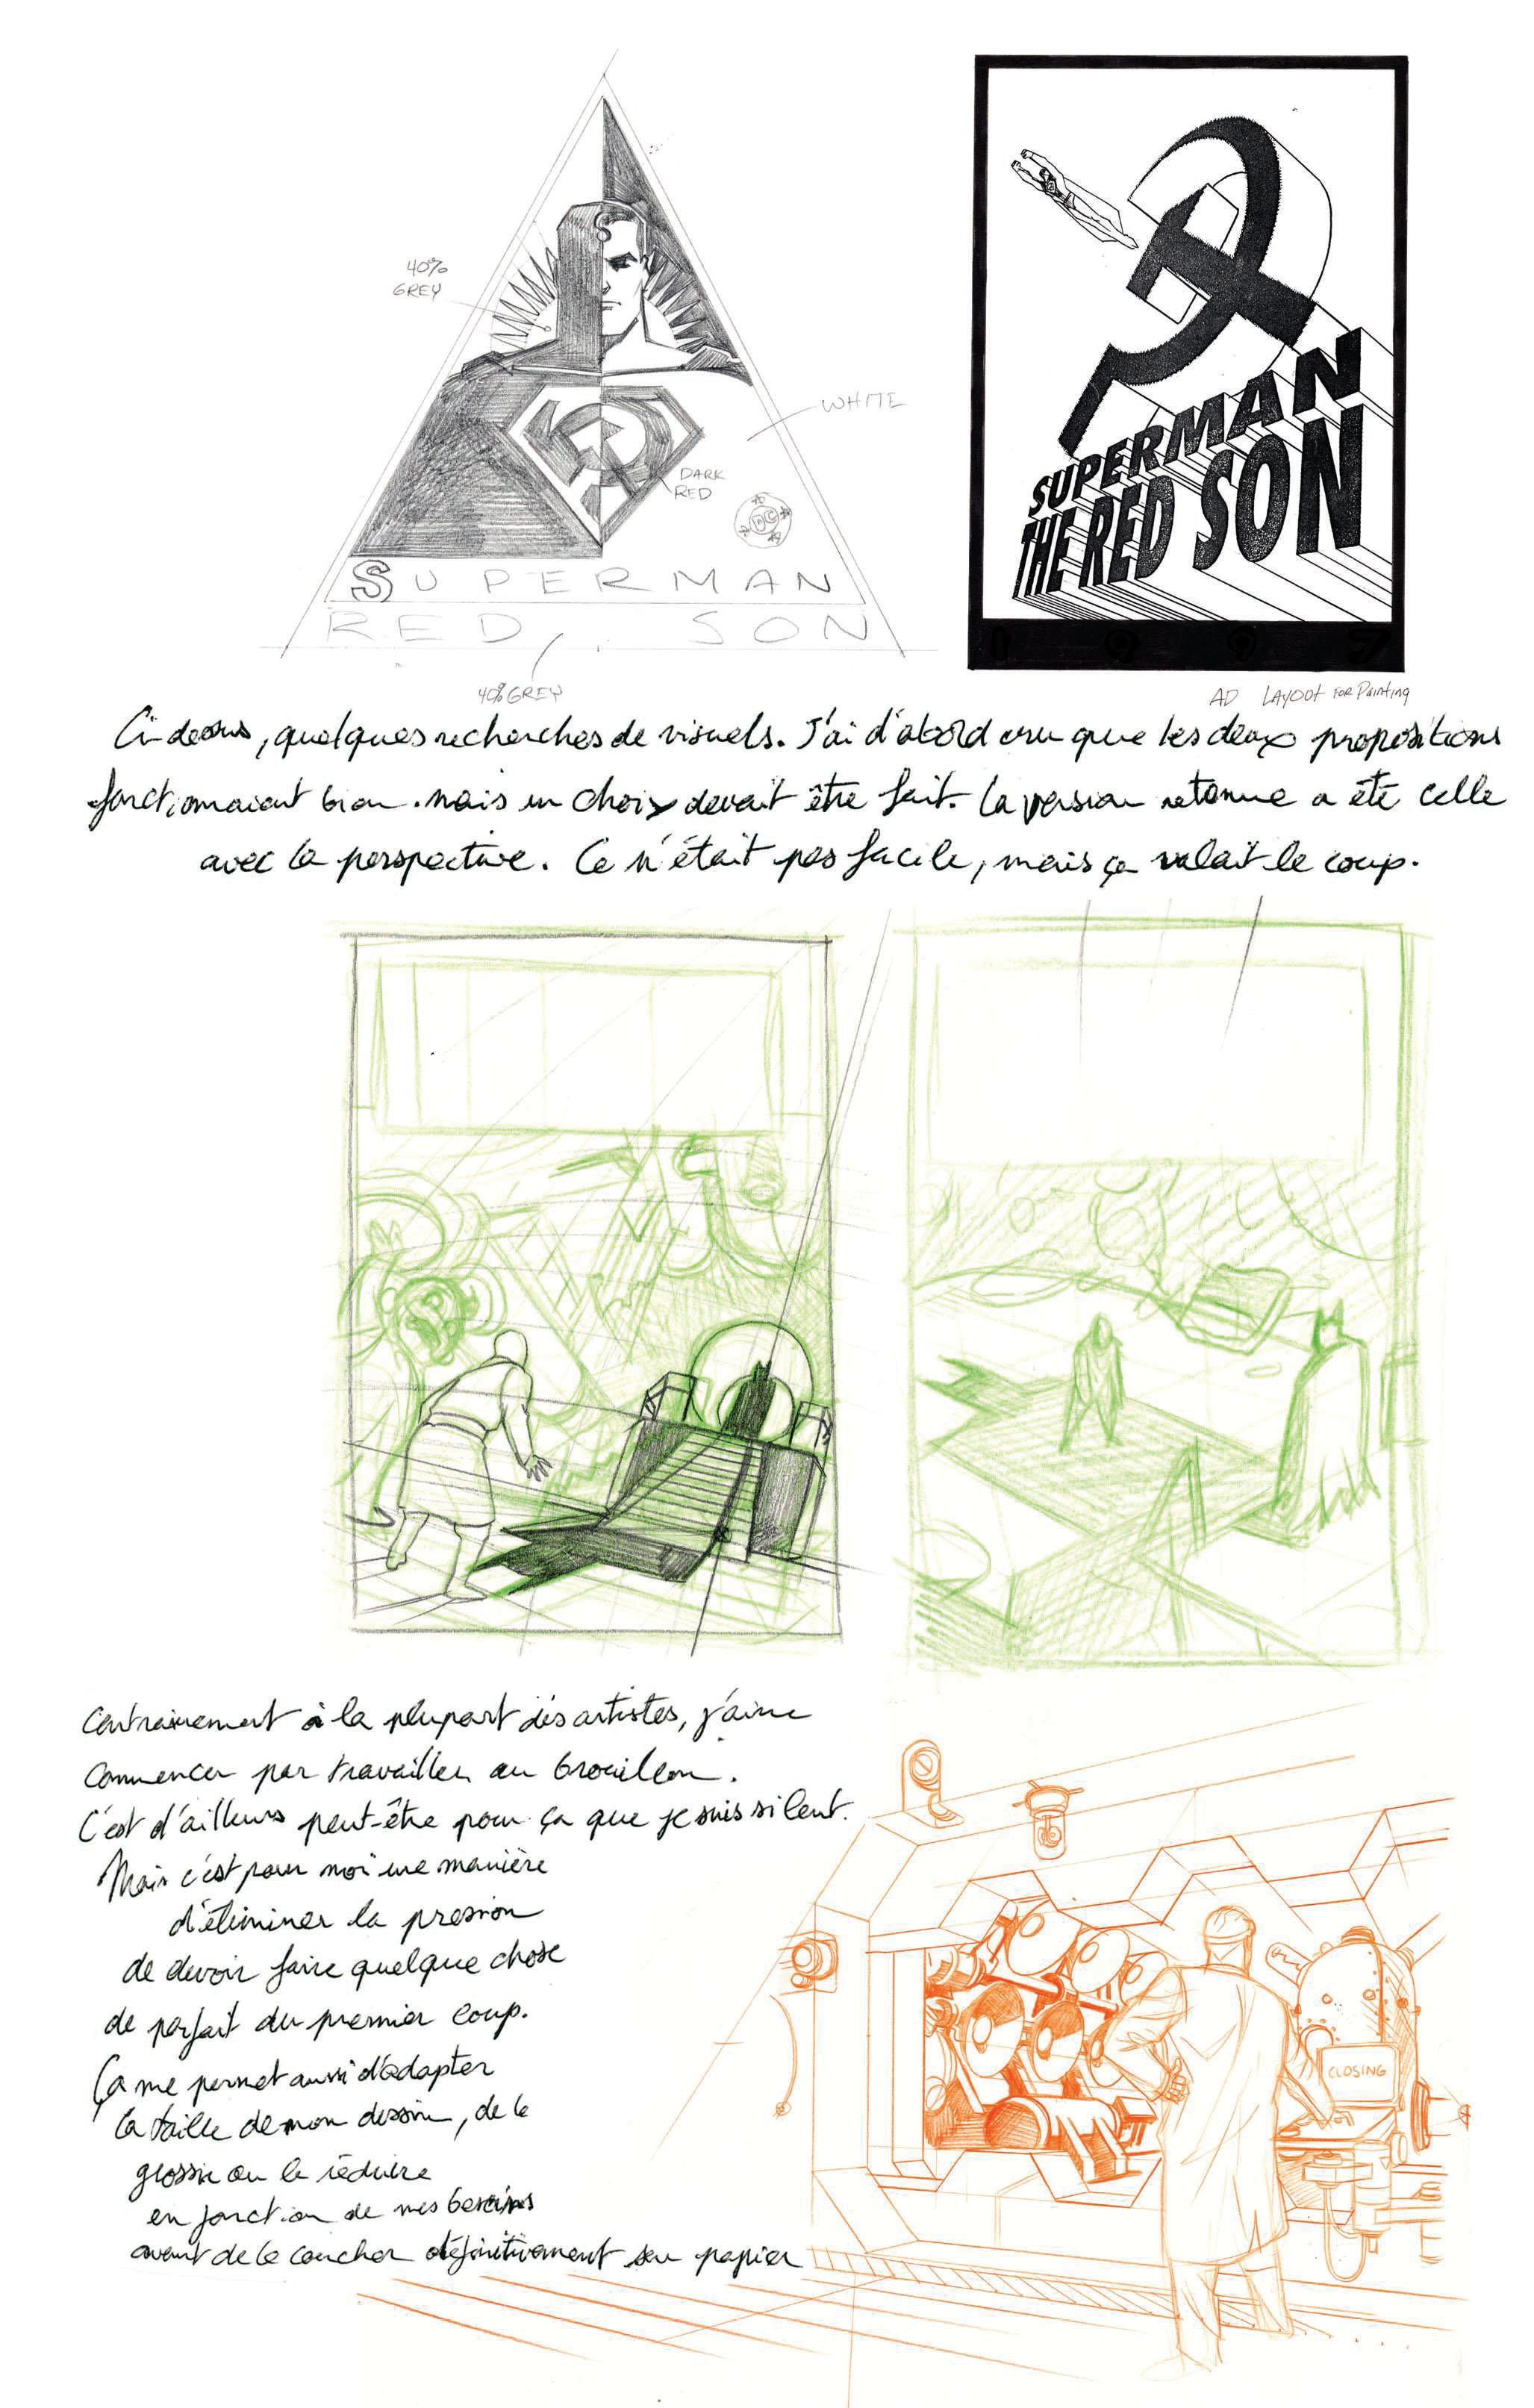 http://www.urban-comics.com/wp-content/uploads/2013/09/croquis05.jpg